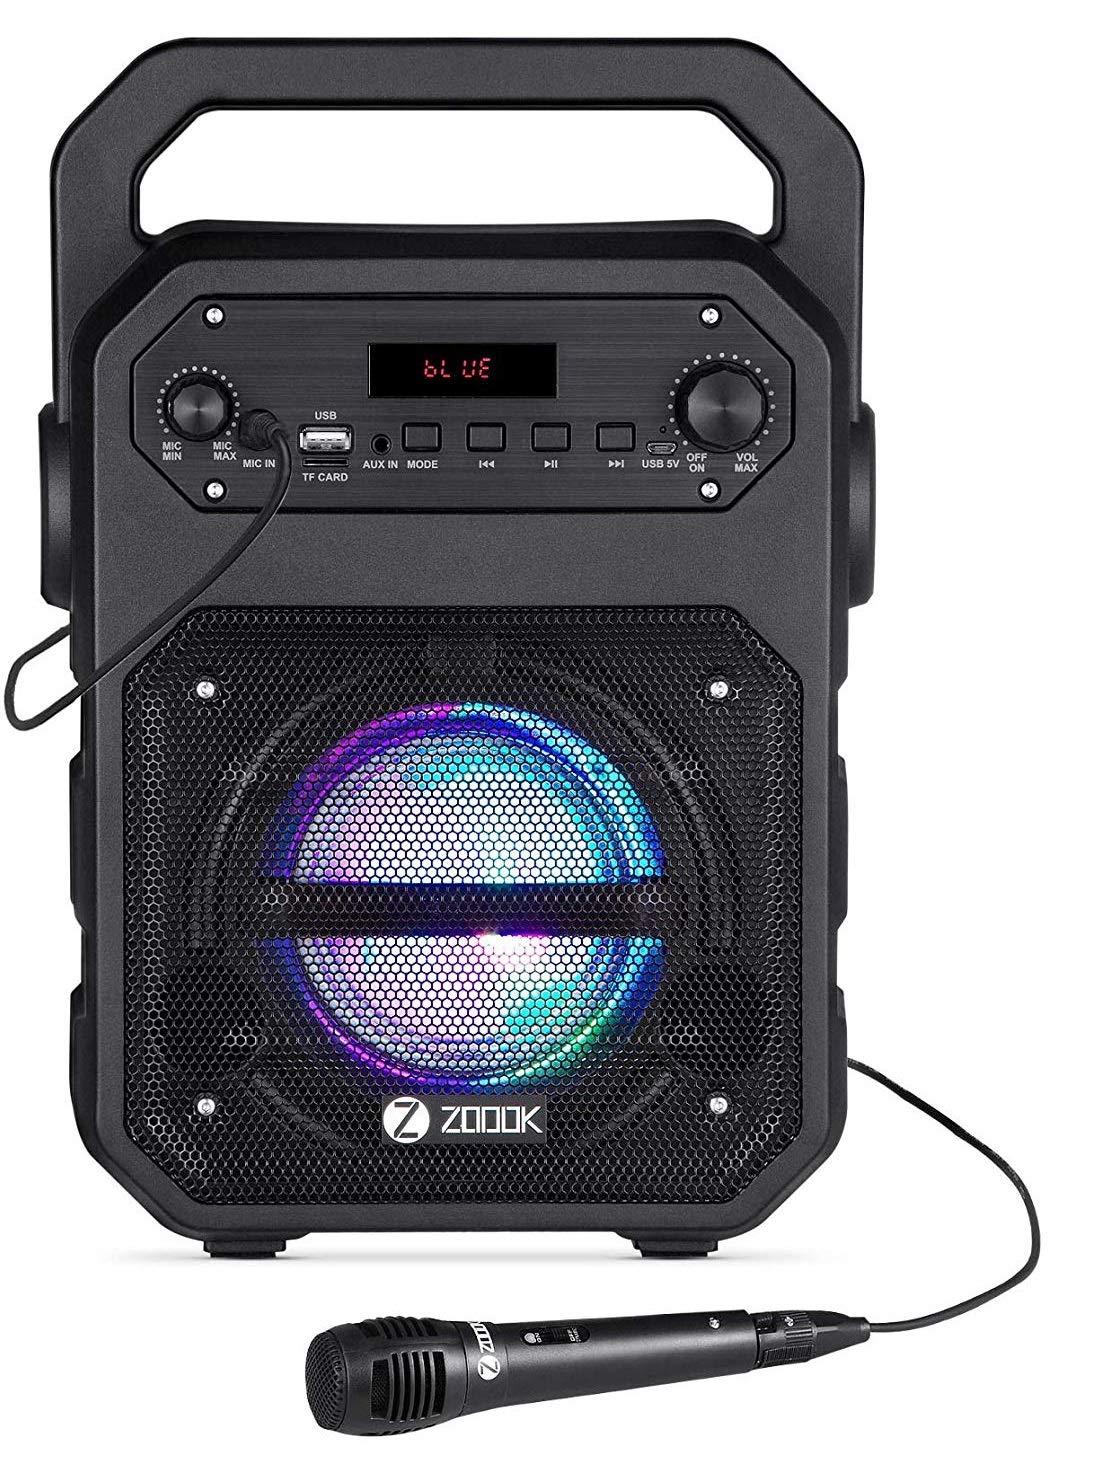 Zoook Rocker Thunder 20 watts Bluetooth Speaker